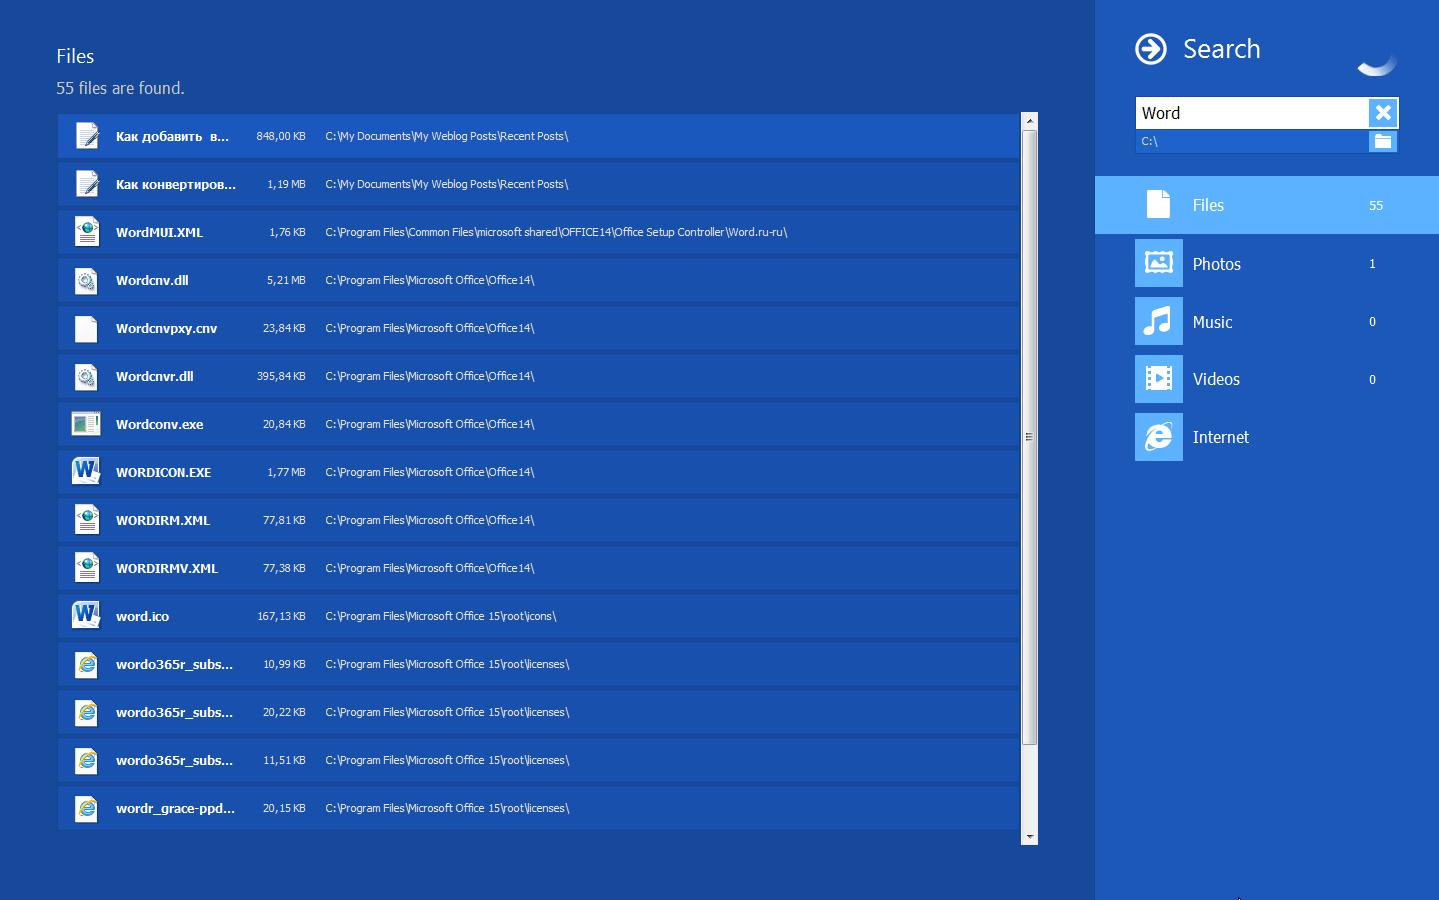 WinMetro: знакомство с интерфейсом Metro UI без переустановки операционной системы